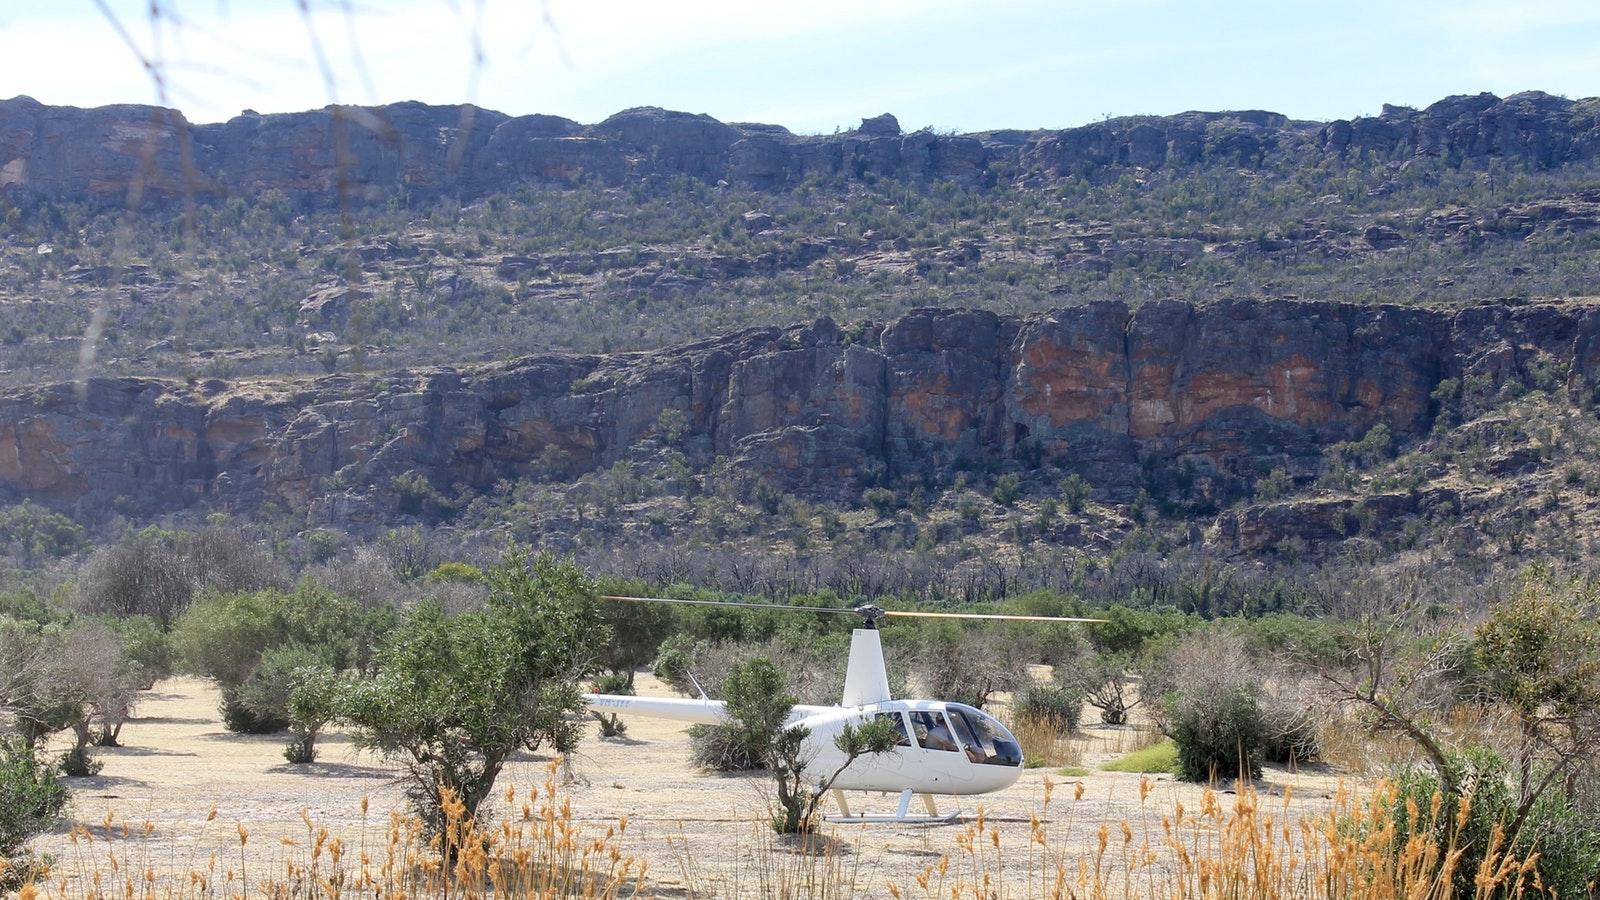 Landing between the olive trees